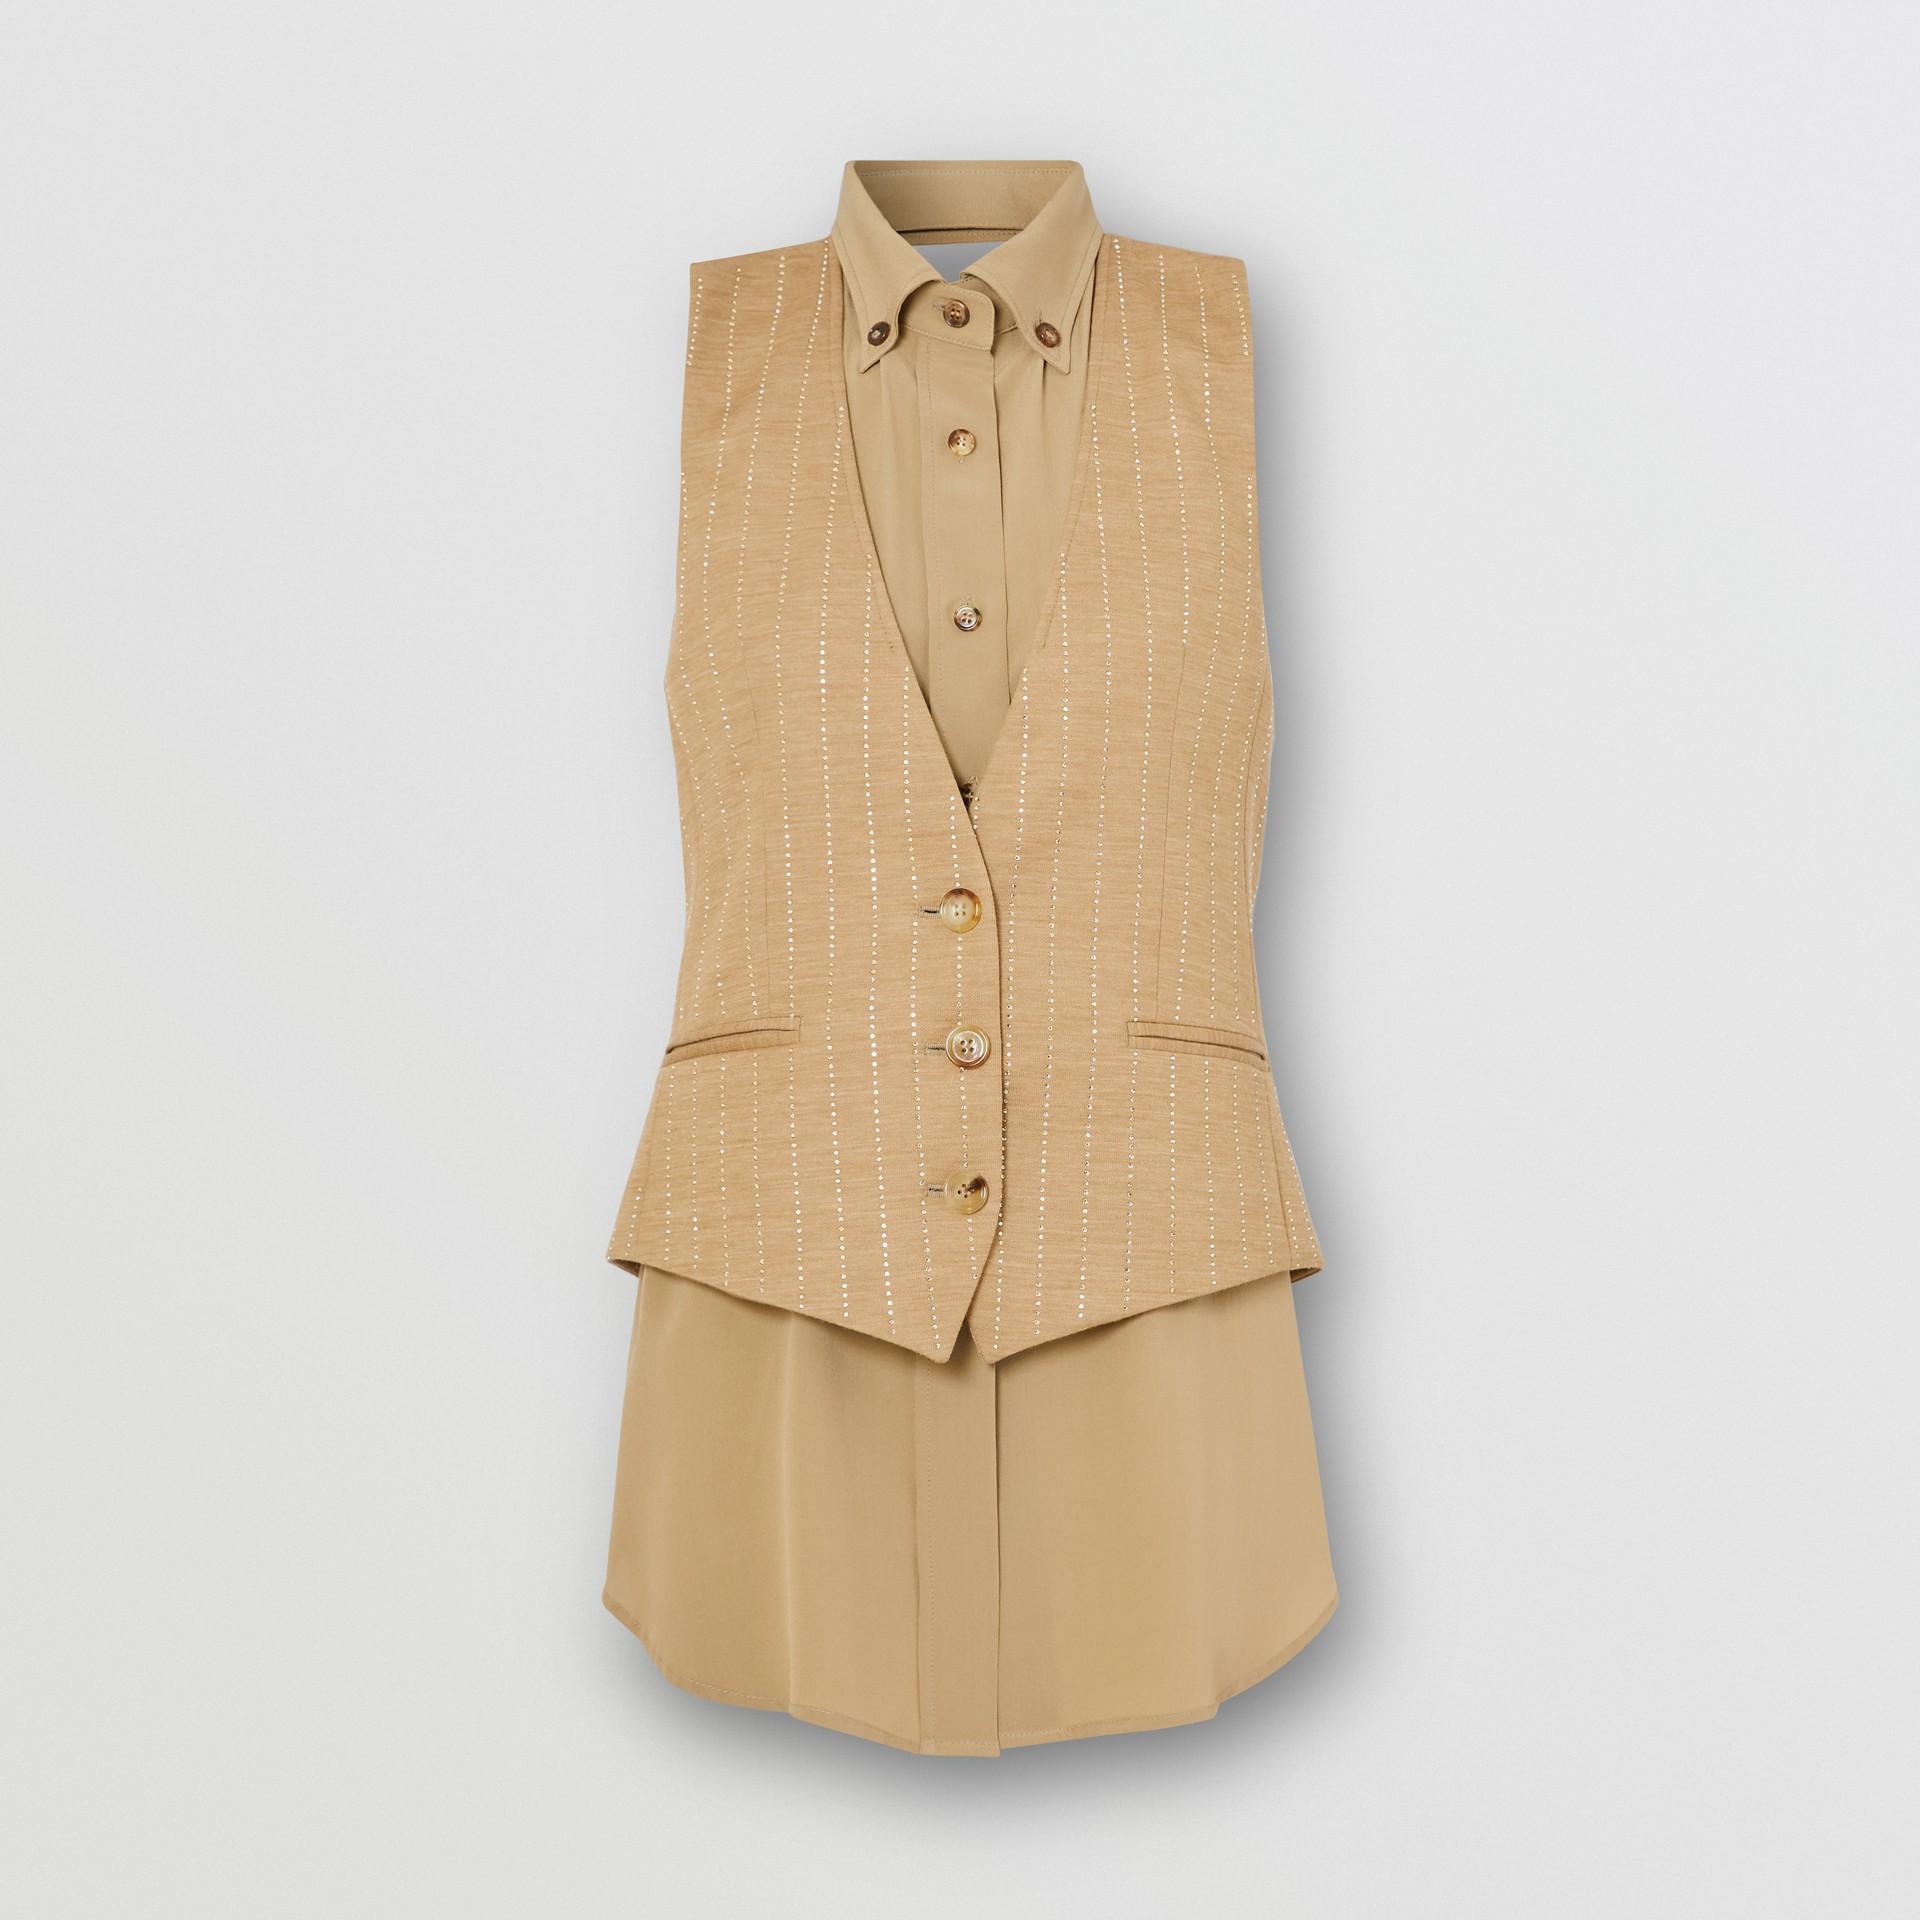 Shirt Detail Crystal Pinstriped Wool Blend Waistcoat in Pecan Melange - Women | Burberry - gallery image 3